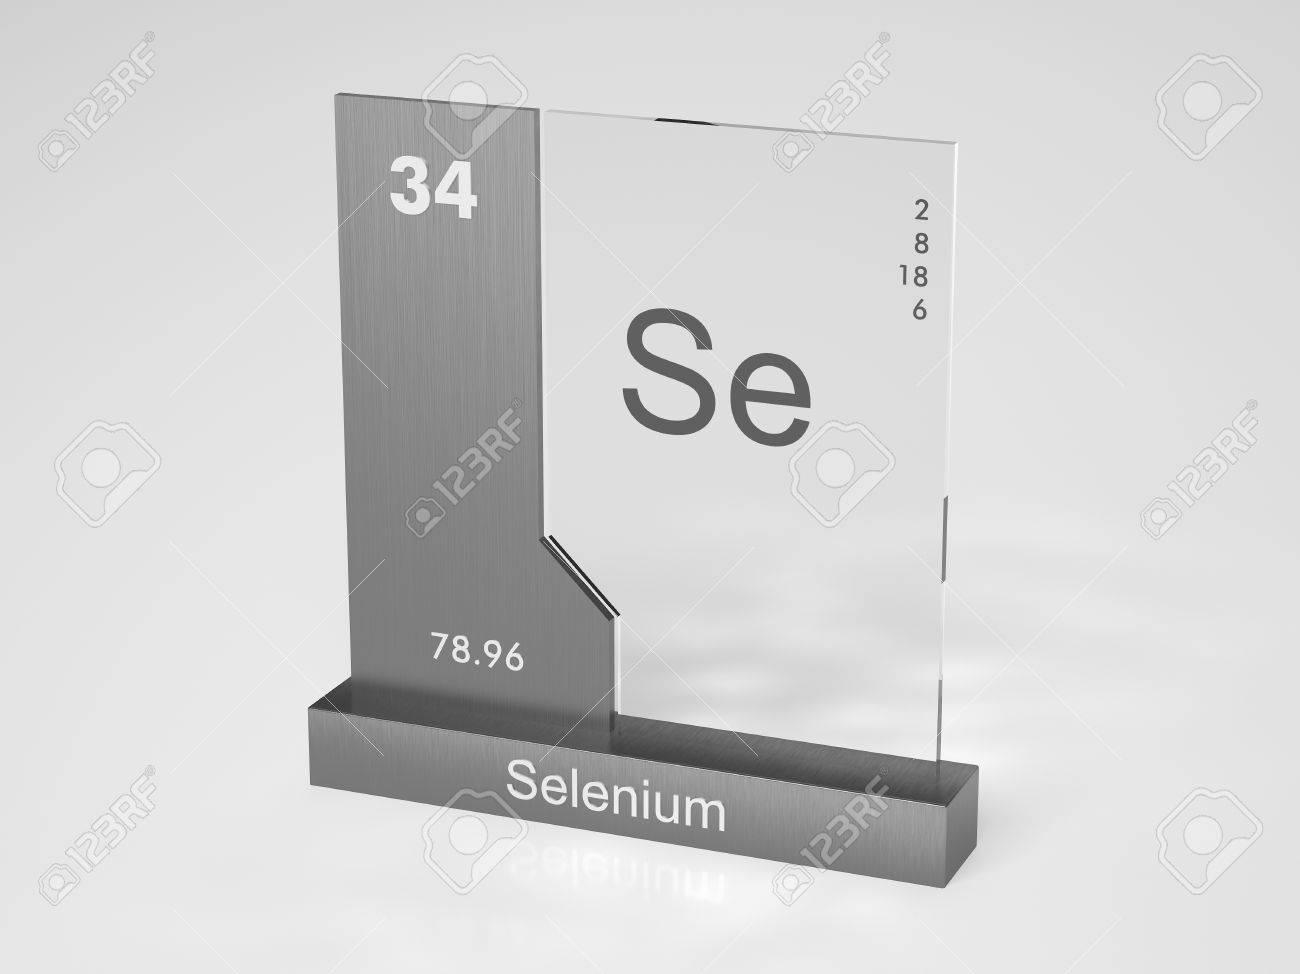 Selenium symbol se stock photo picture and royalty free image selenium symbol se stock photo 10230170 buycottarizona